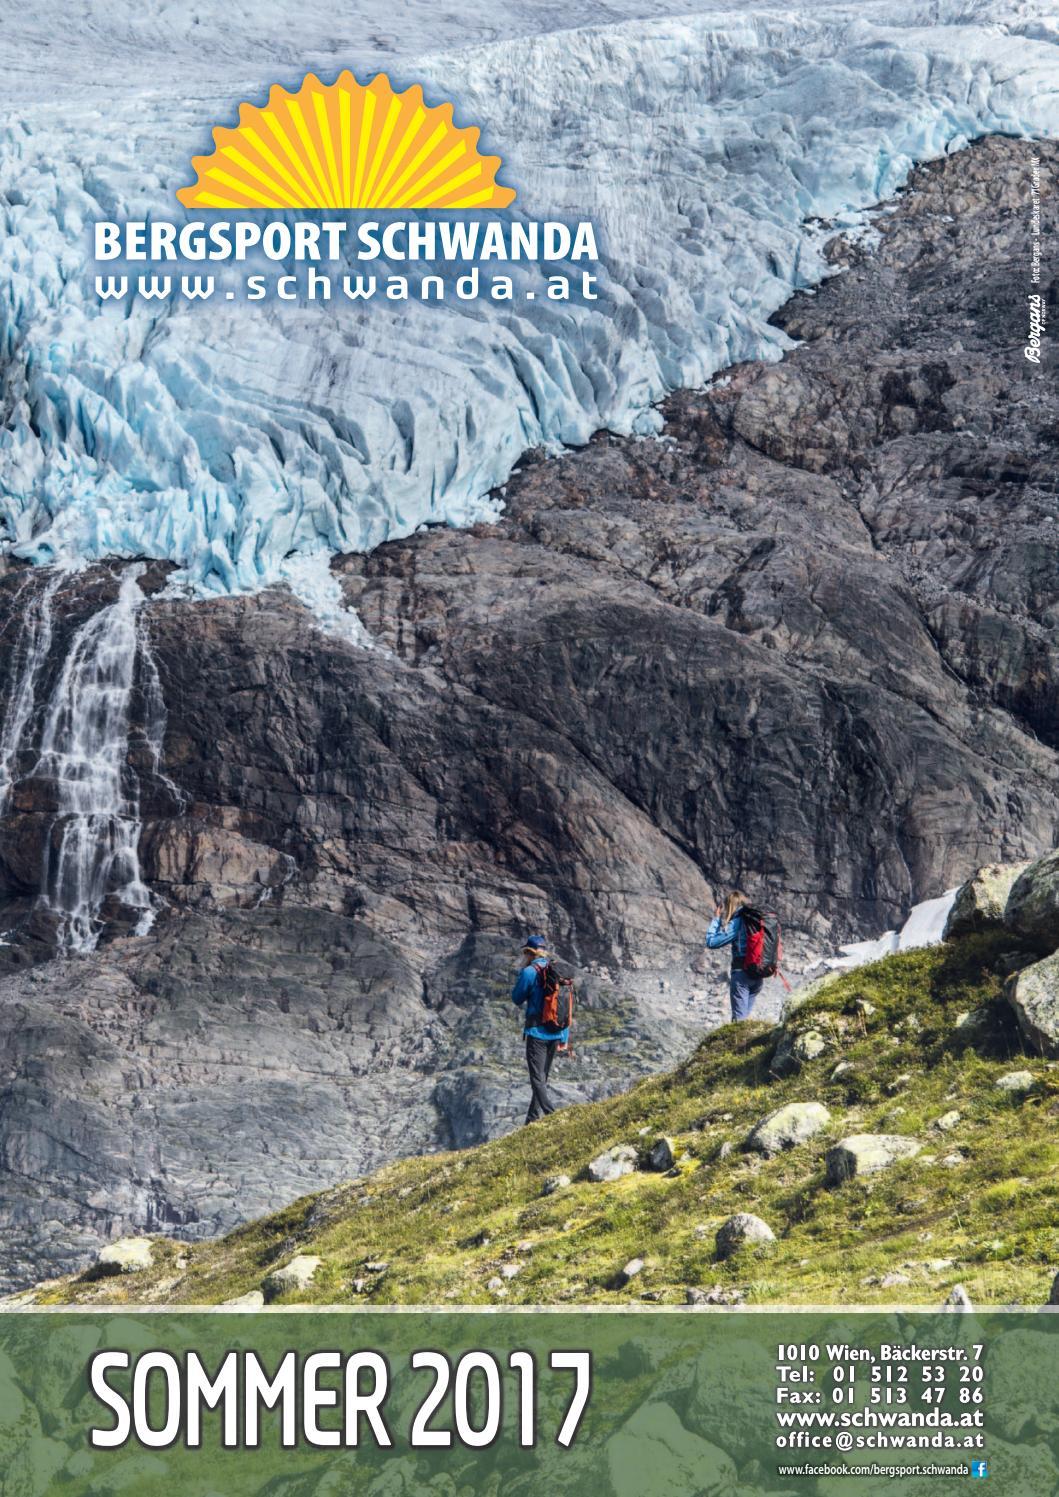 Bergsport schwanda sommer 2017 by Bergsport.Schwanda - issuu